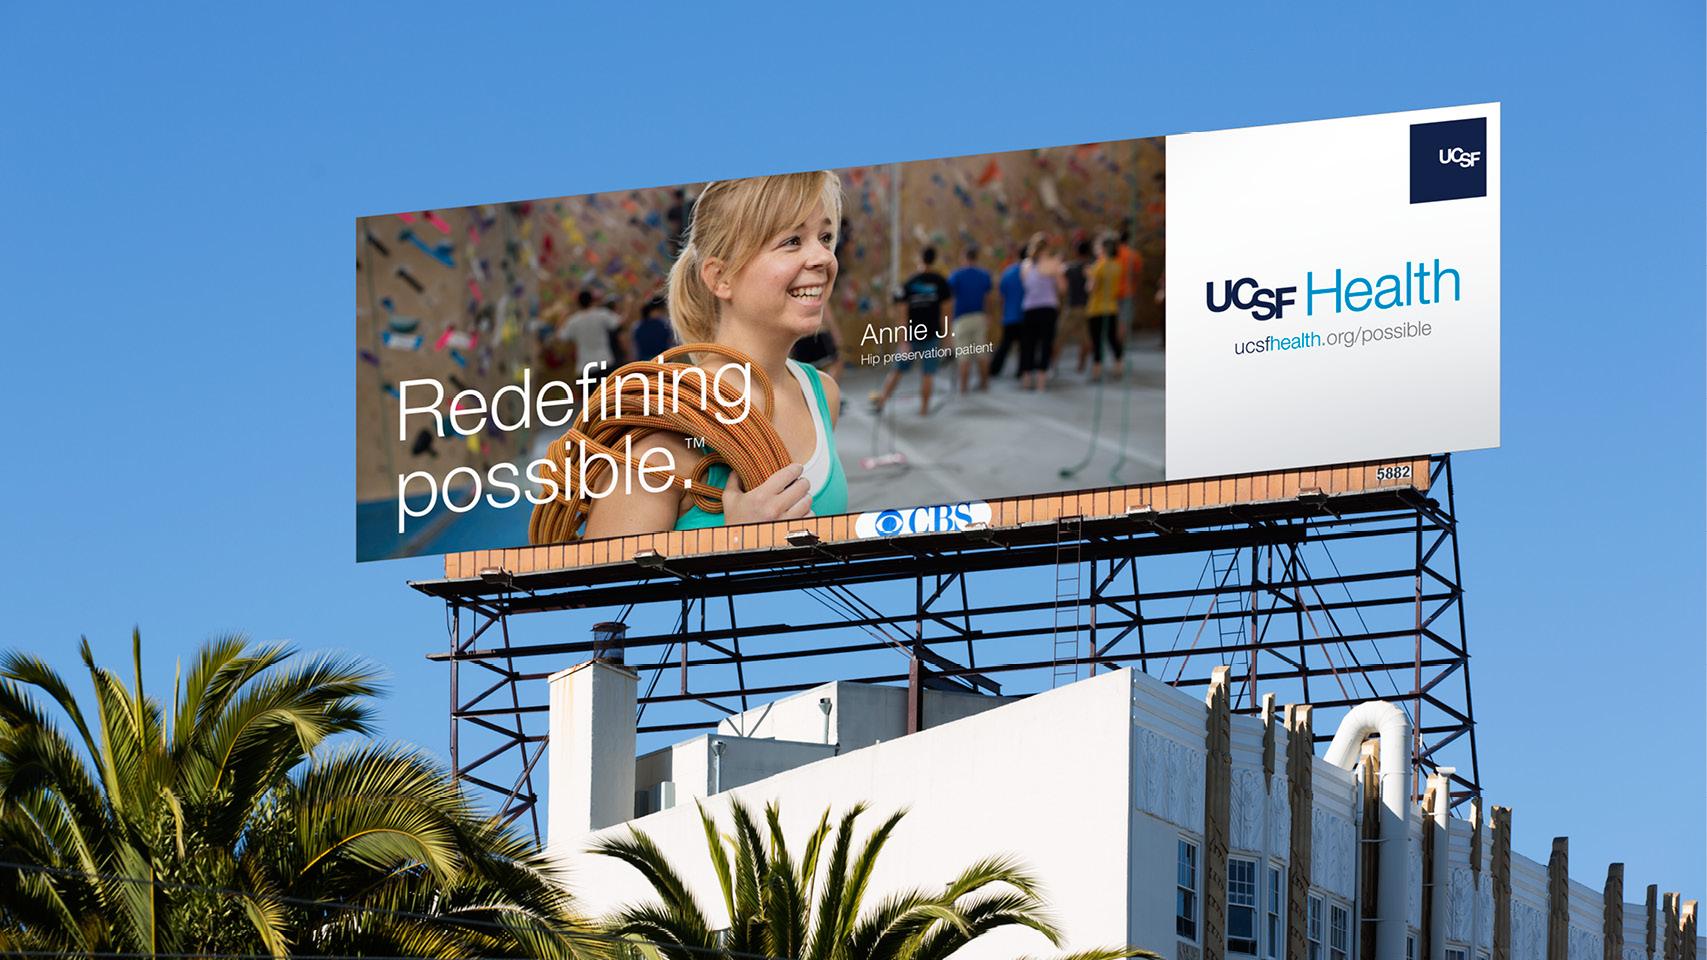 ucsf-billboard-1.jpg